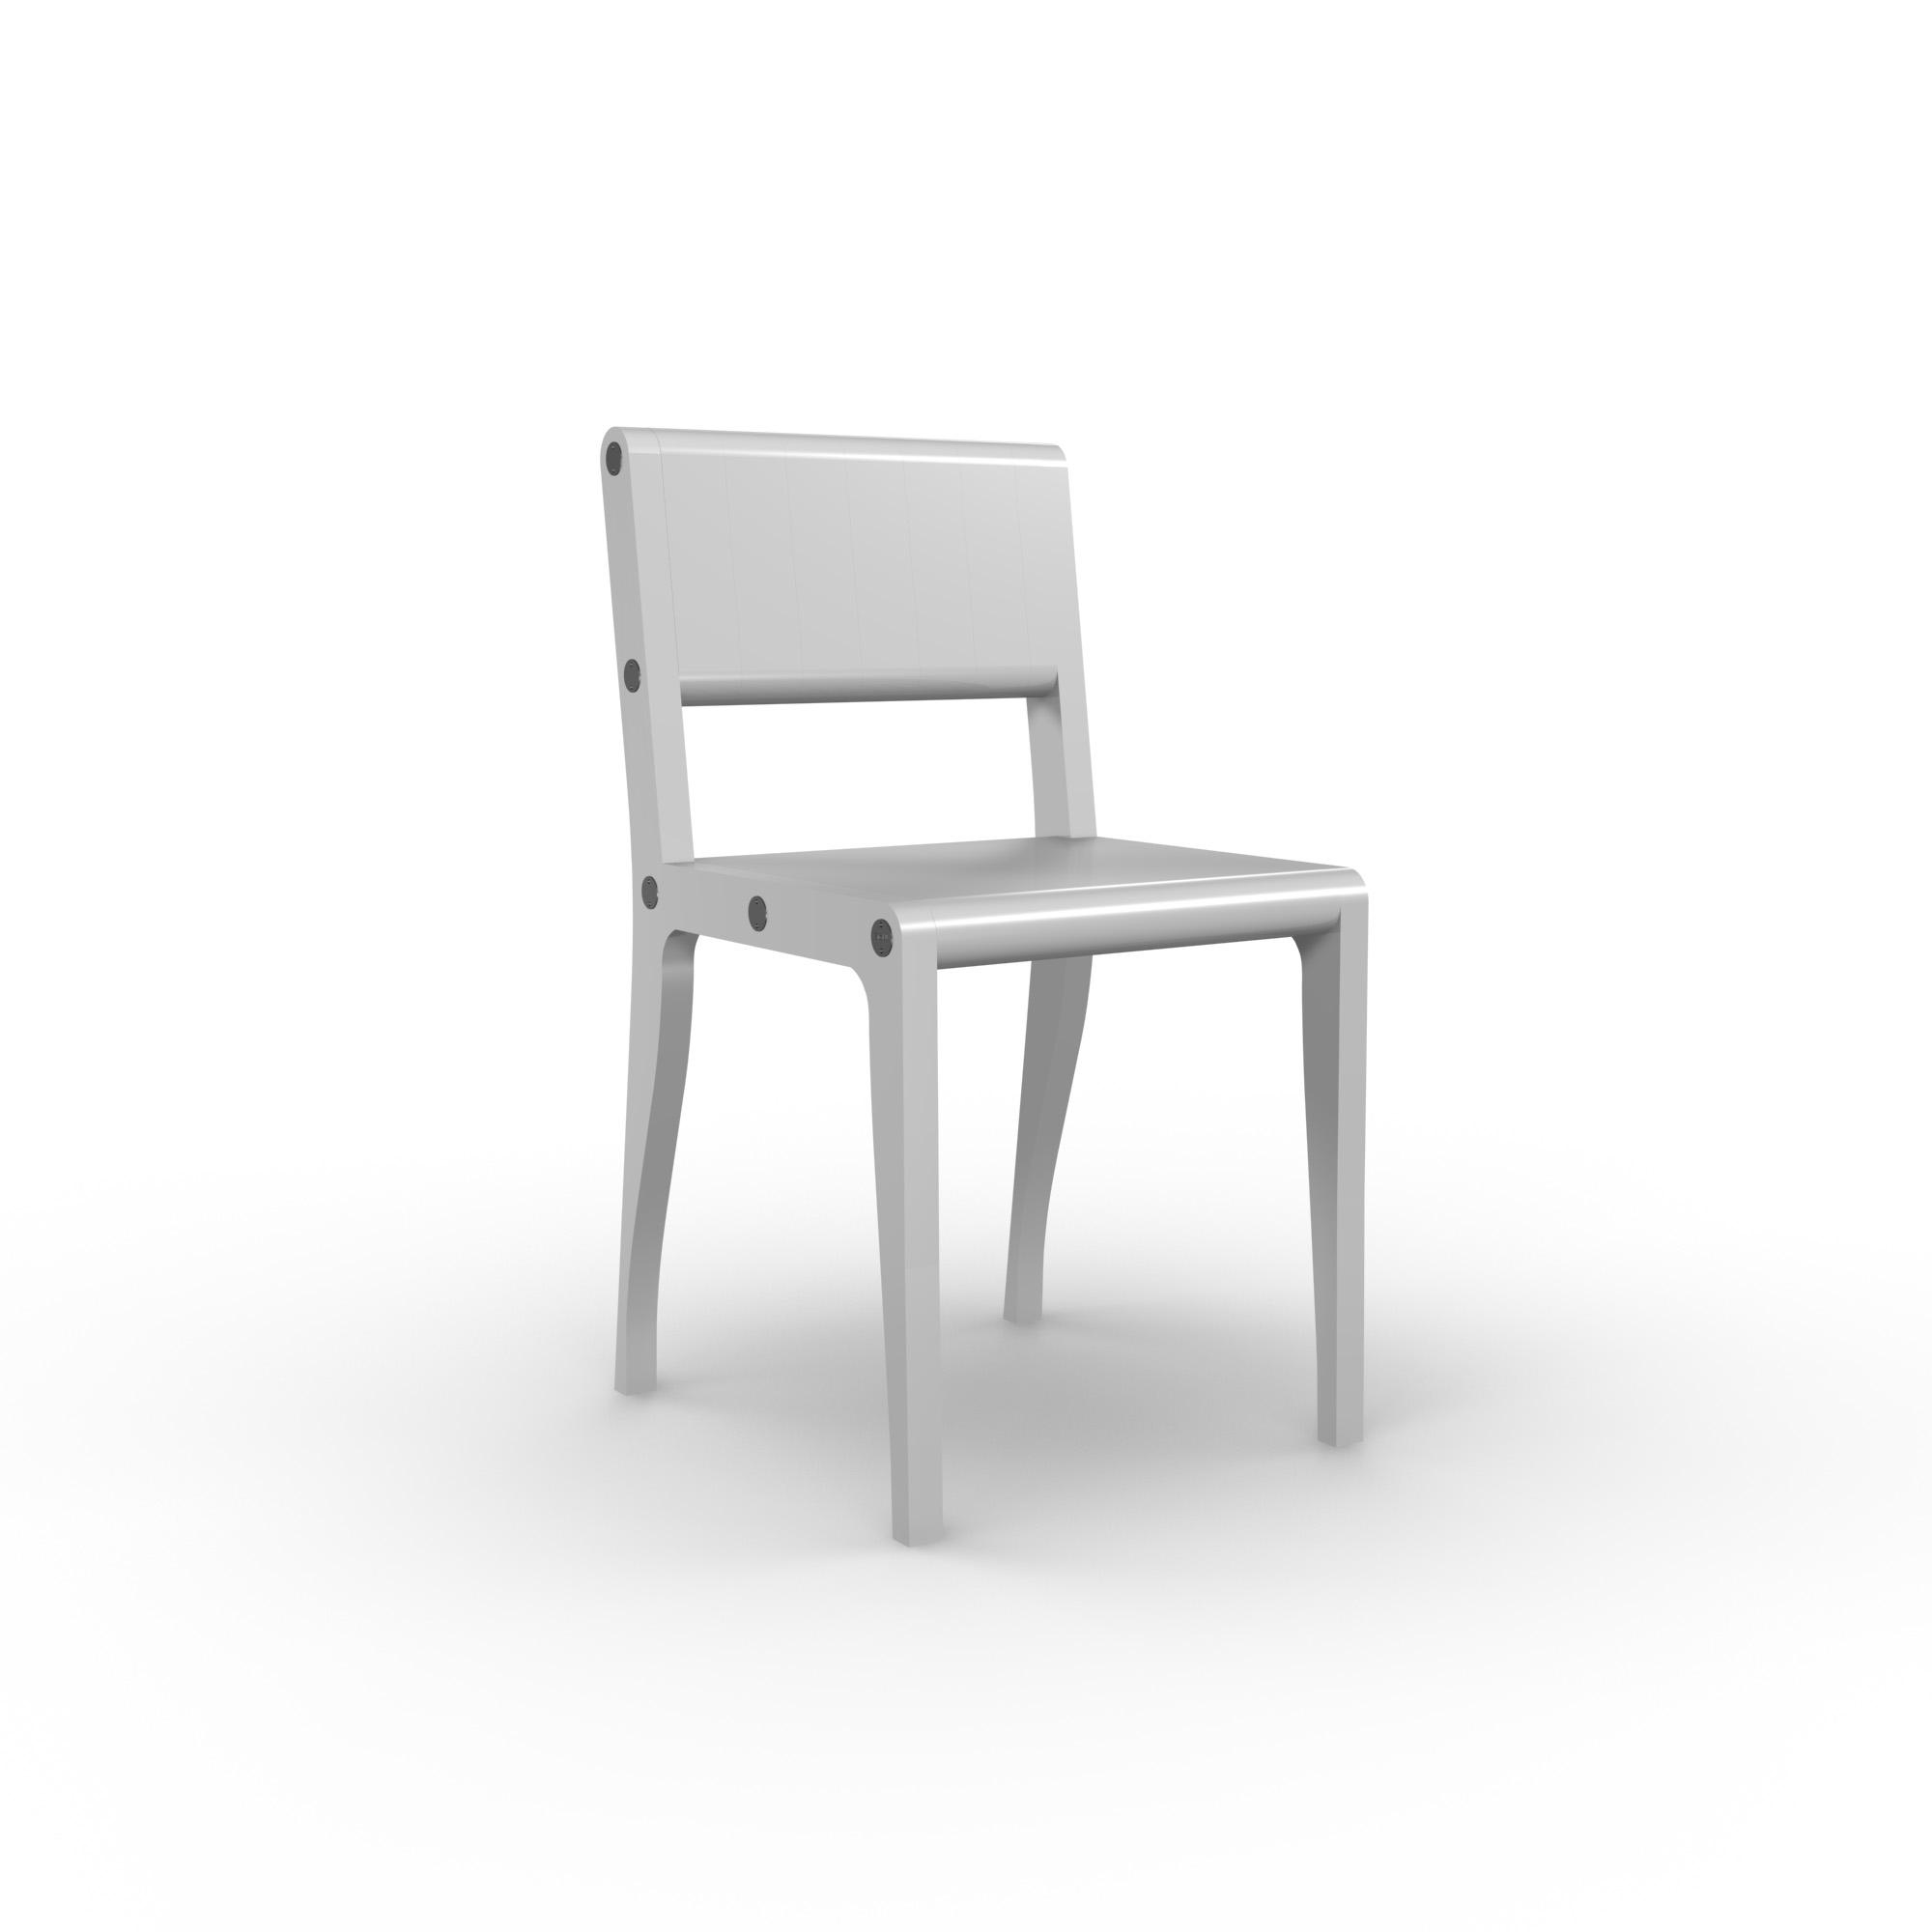 diseño industrial santander - Beusual - Sirak - silla white